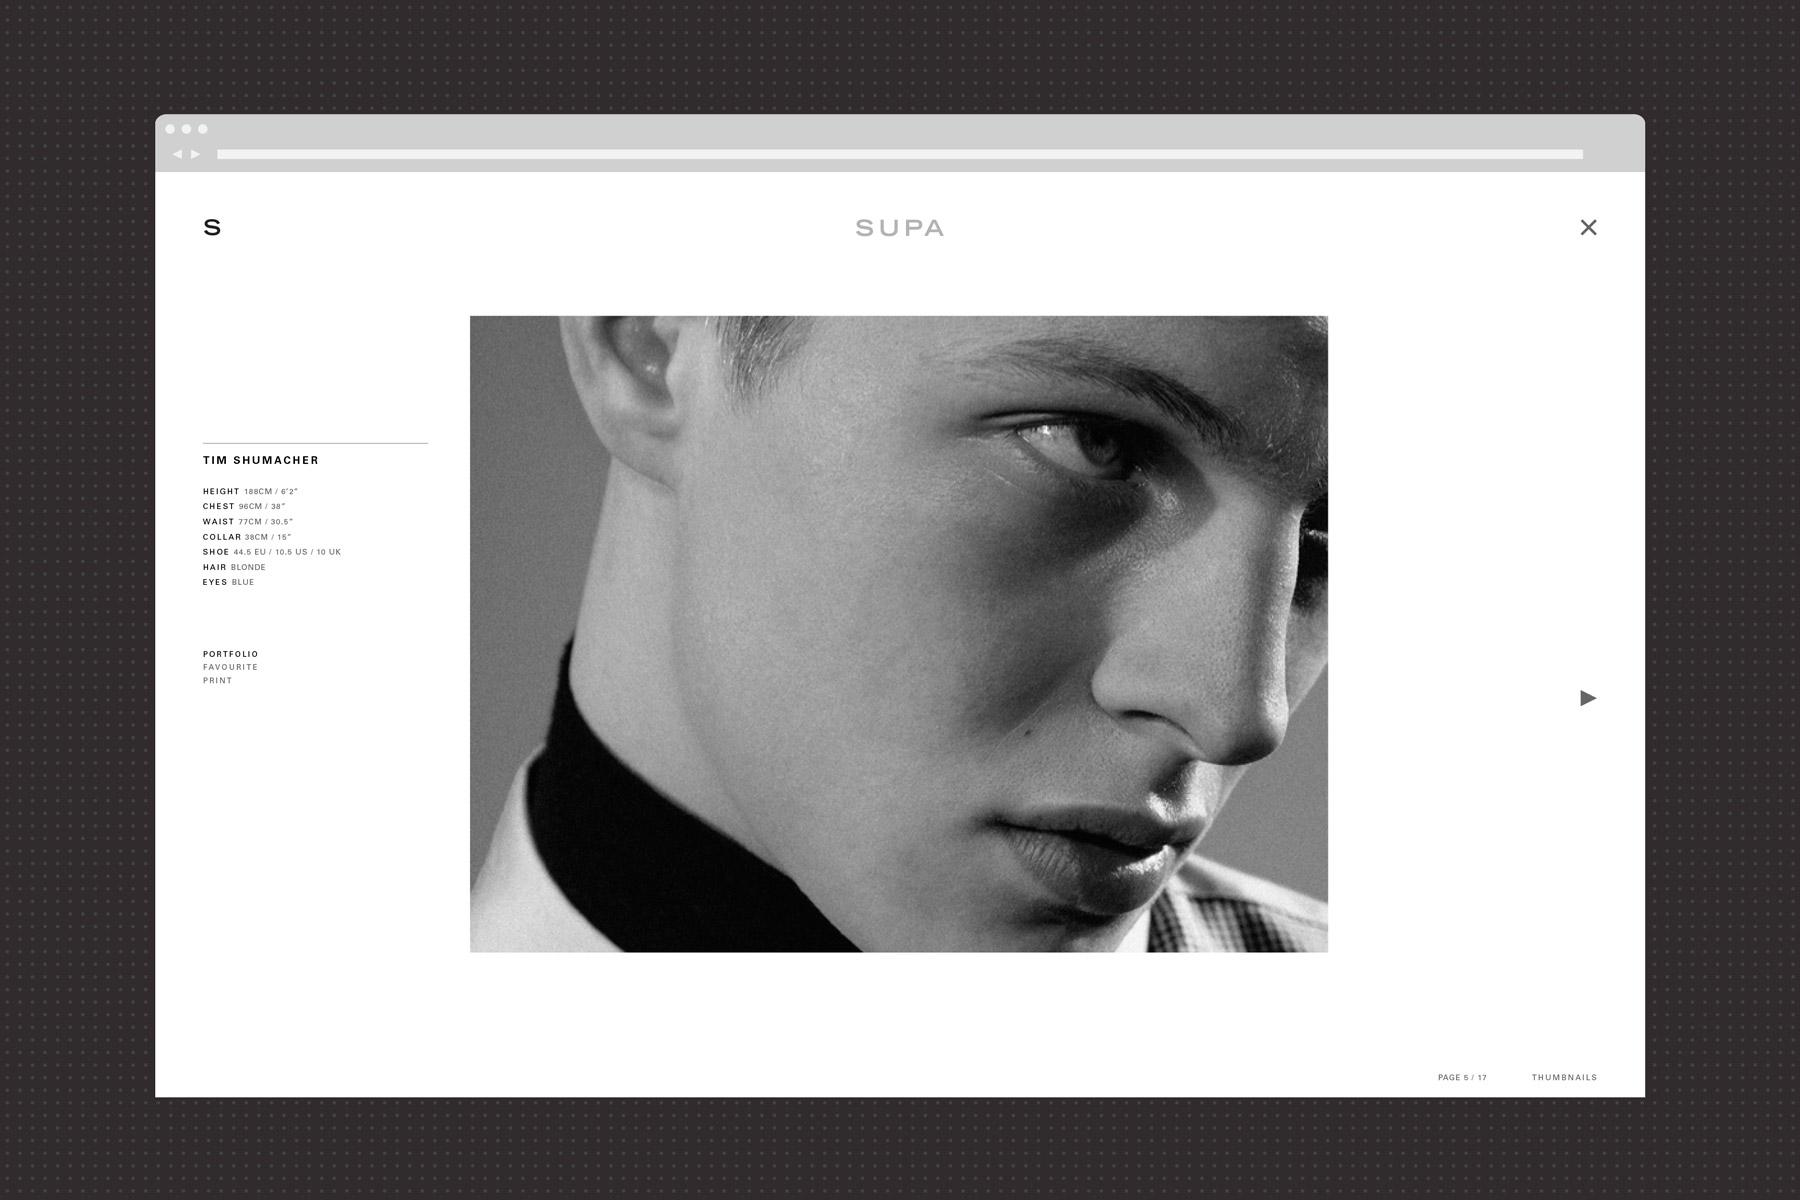 Supa Model Management – Studio AS-CC